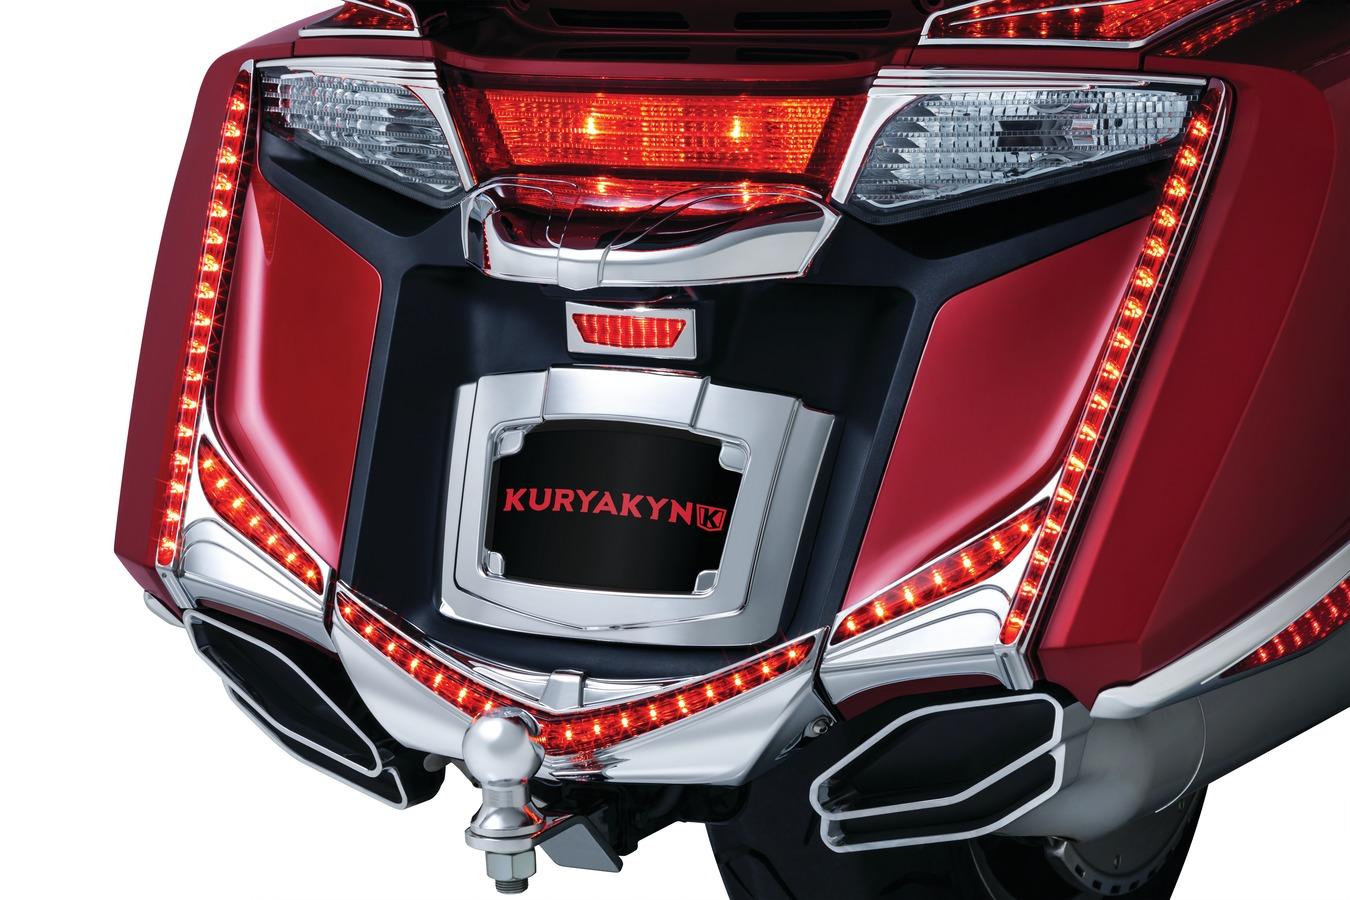 Honda goldwing kuryakyn led vertical rear runbrake light strips does not apply aloadofball Image collections